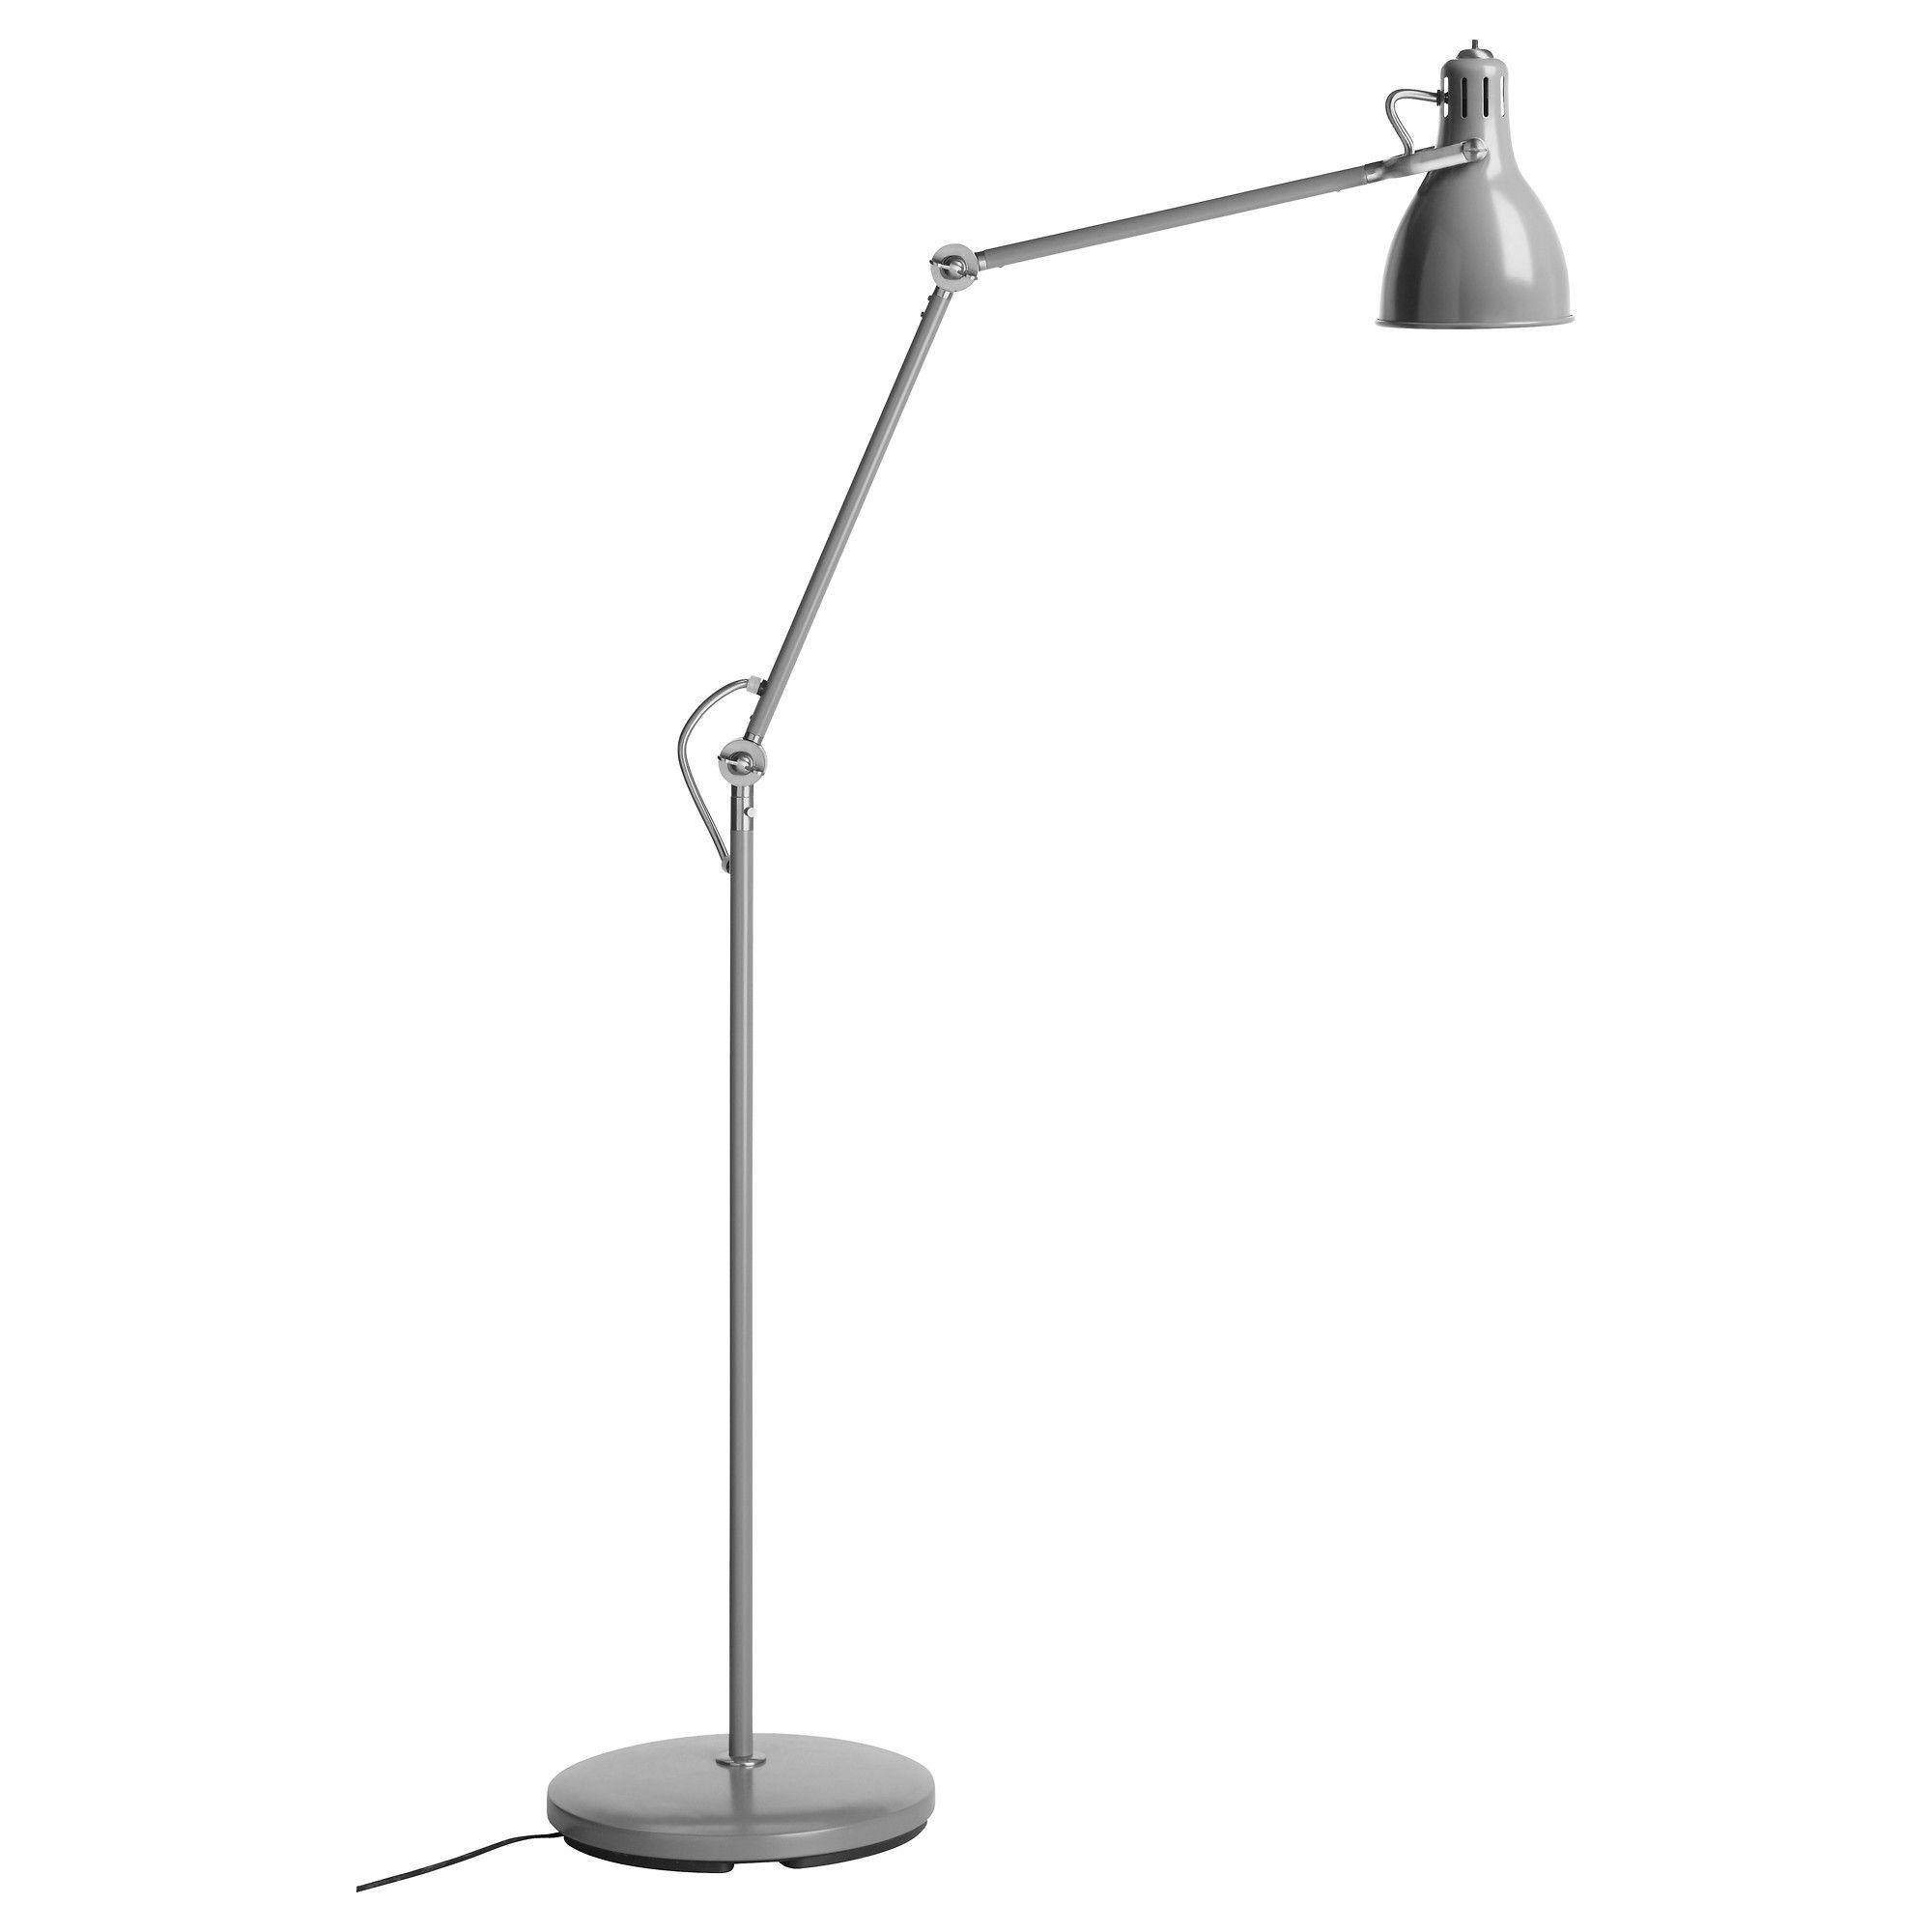 Arc Stehlampe Ikea Ikea Stehlampe Stehlampe Lampen